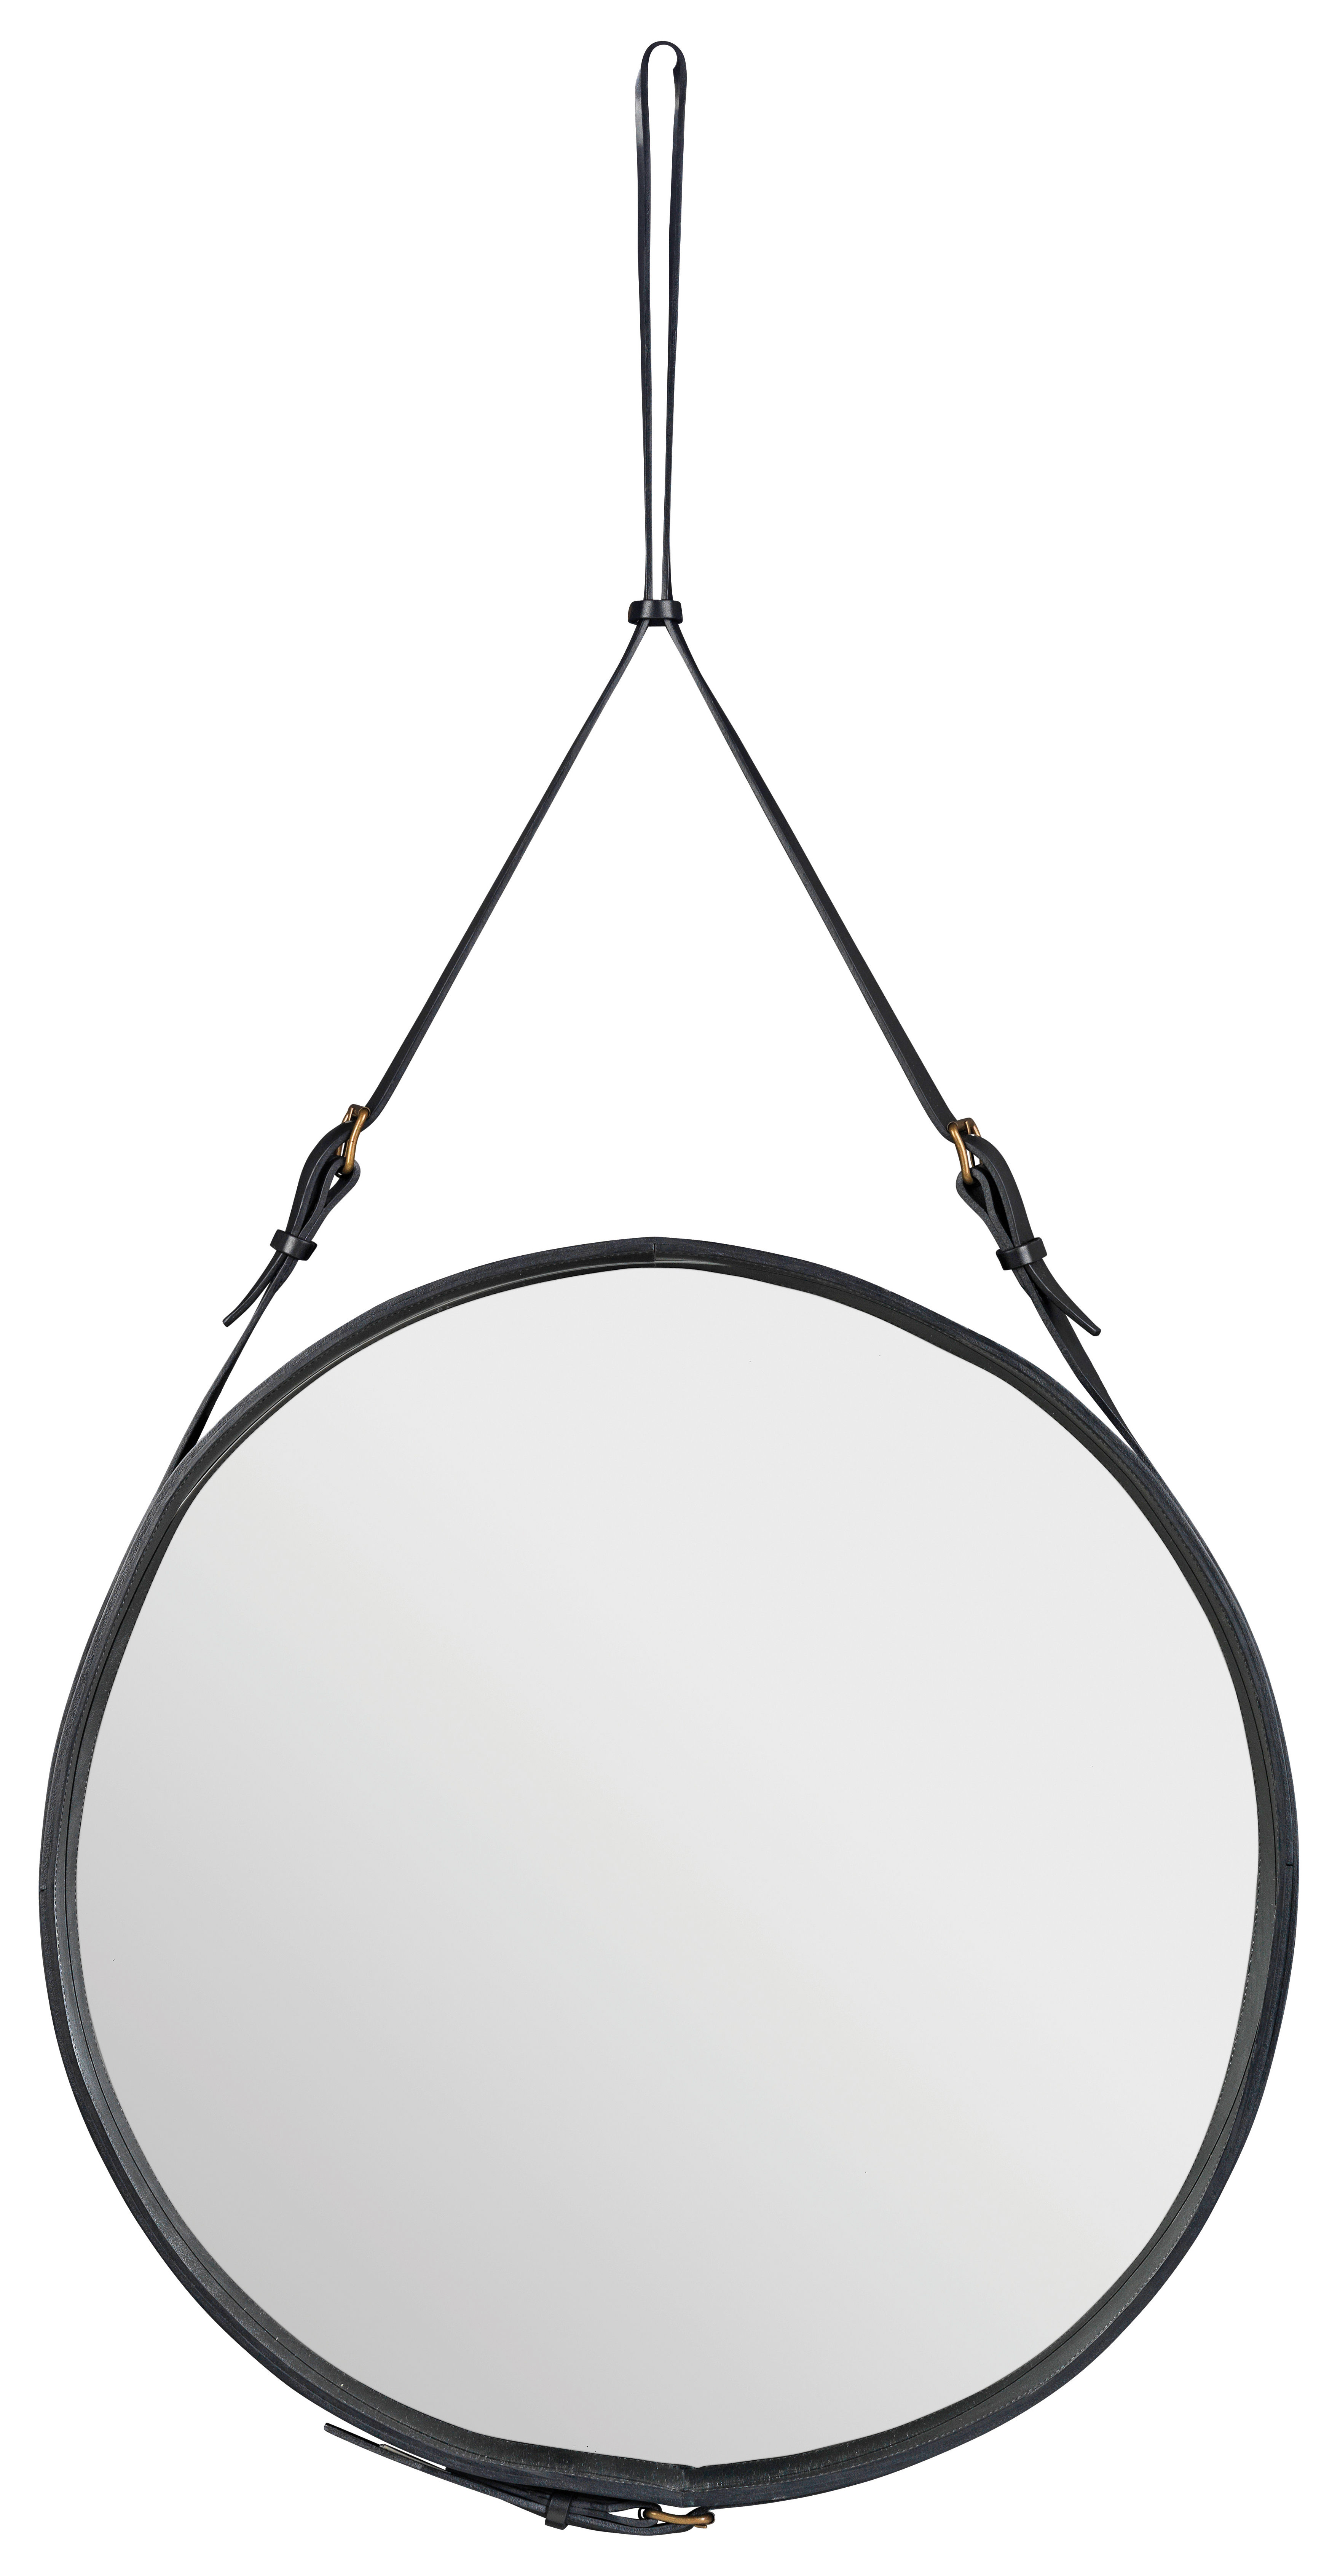 Möbel - Spiegel - Adnet Wandspiegel Ø 70 cm - Gubi - Schwarz - Leder